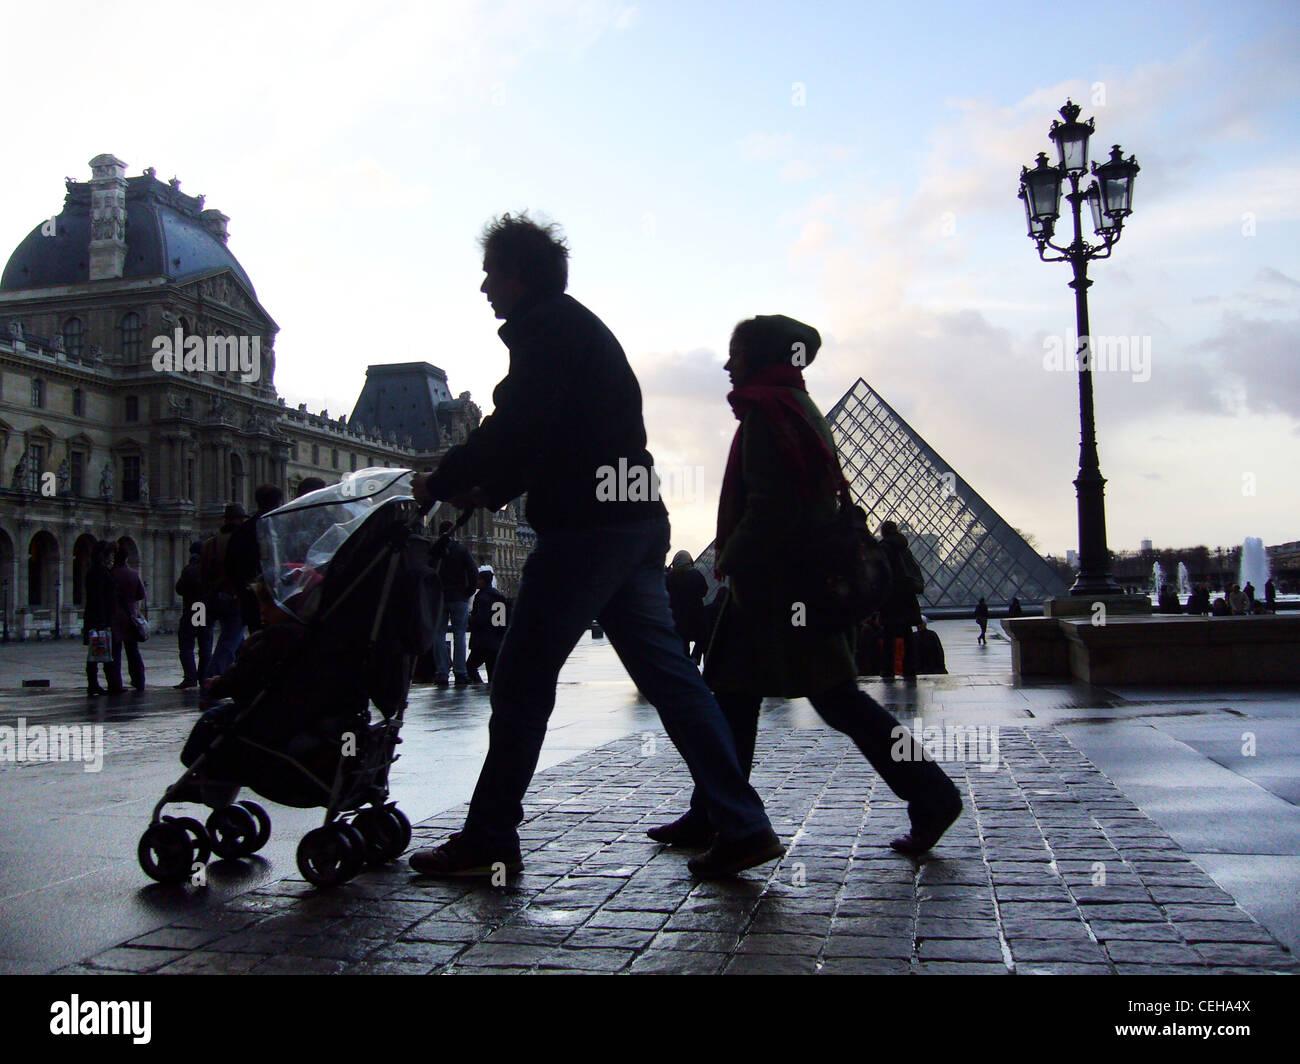 Silhouetten an einem regnerischen Tag in Place du Carrousel du Louvre, Paris, Frankreich Stockfoto